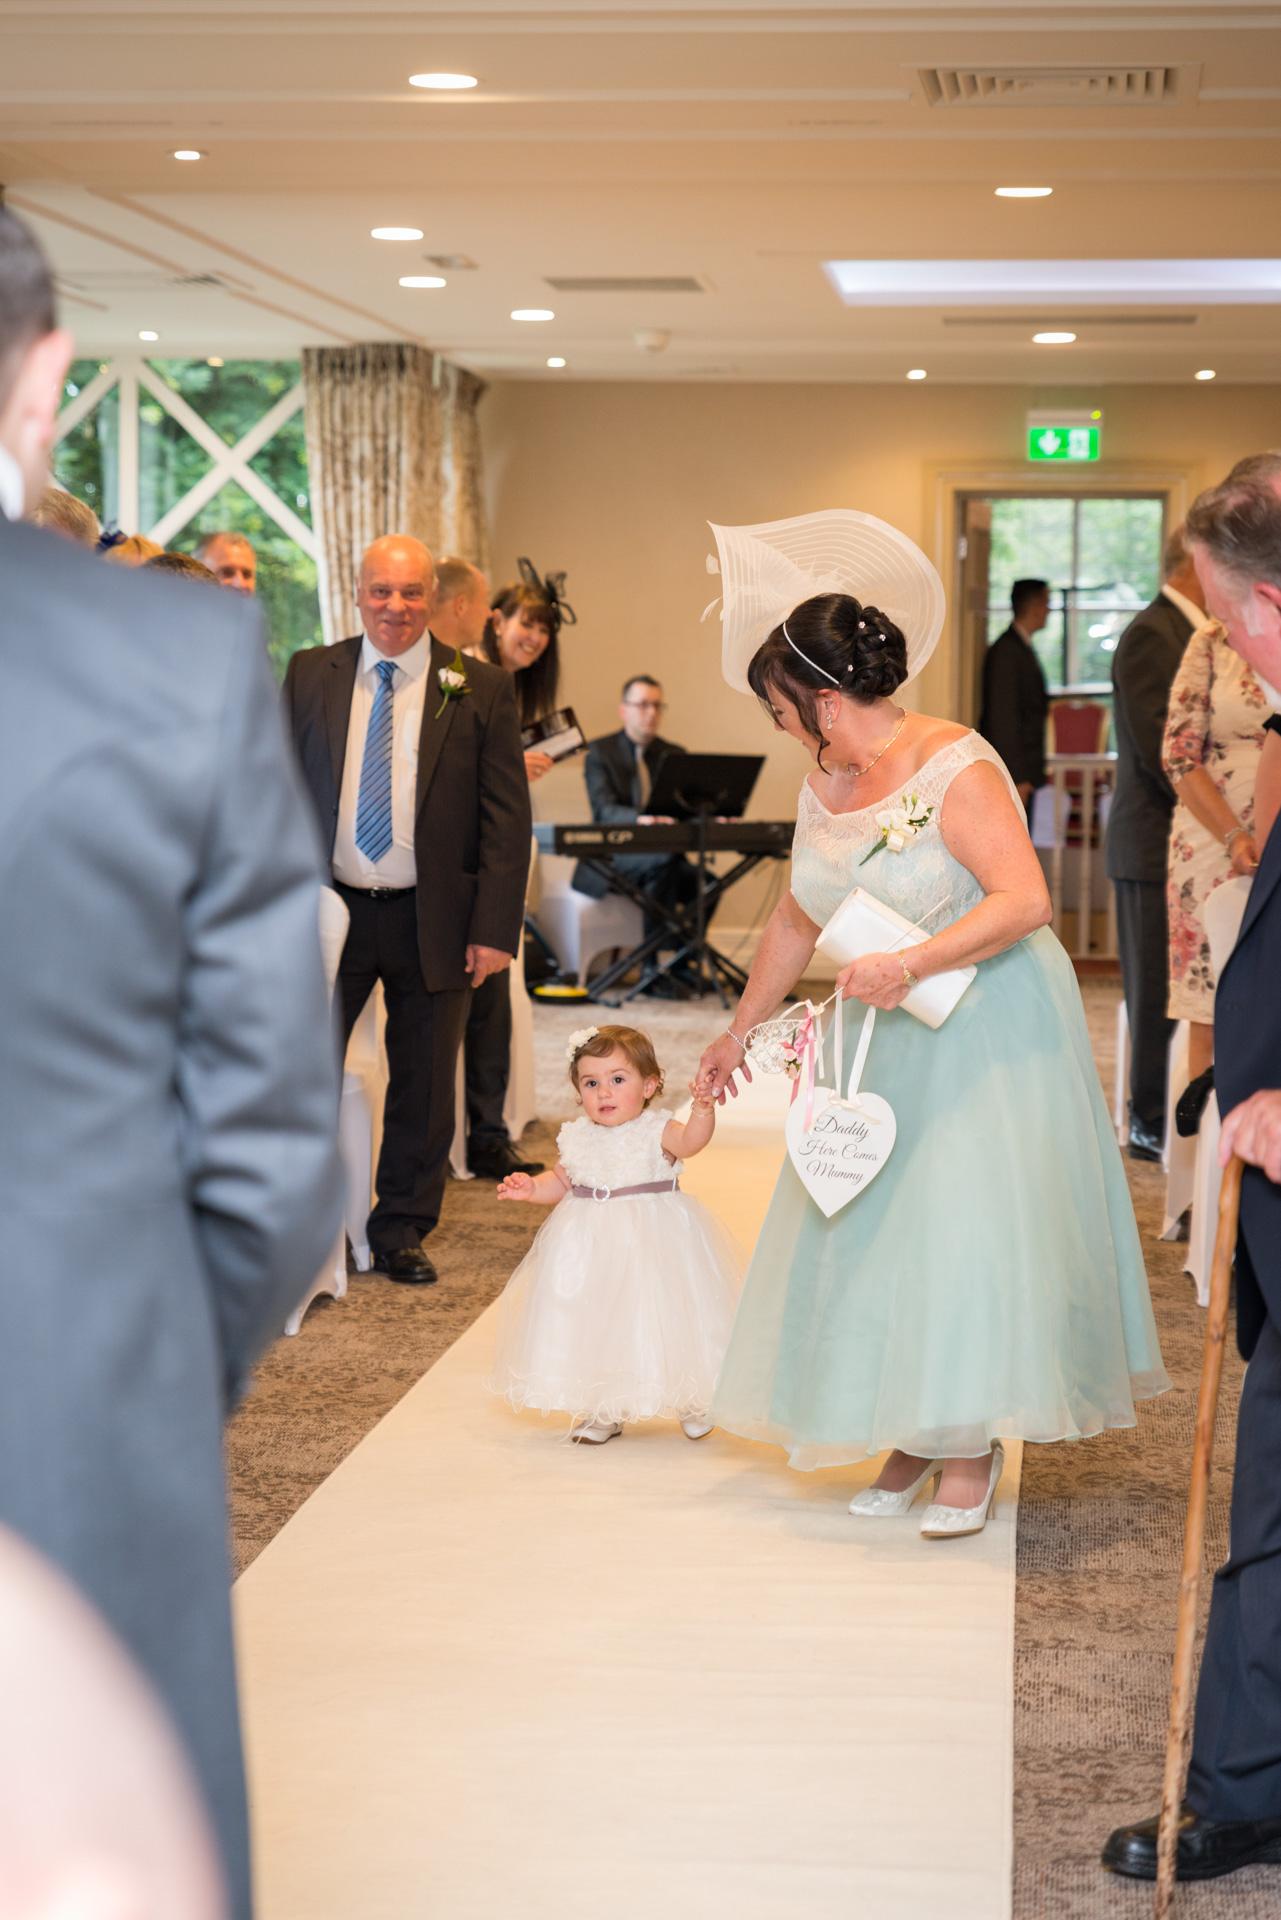 Crabwall Manor Wedding Photography, Affordable wedding